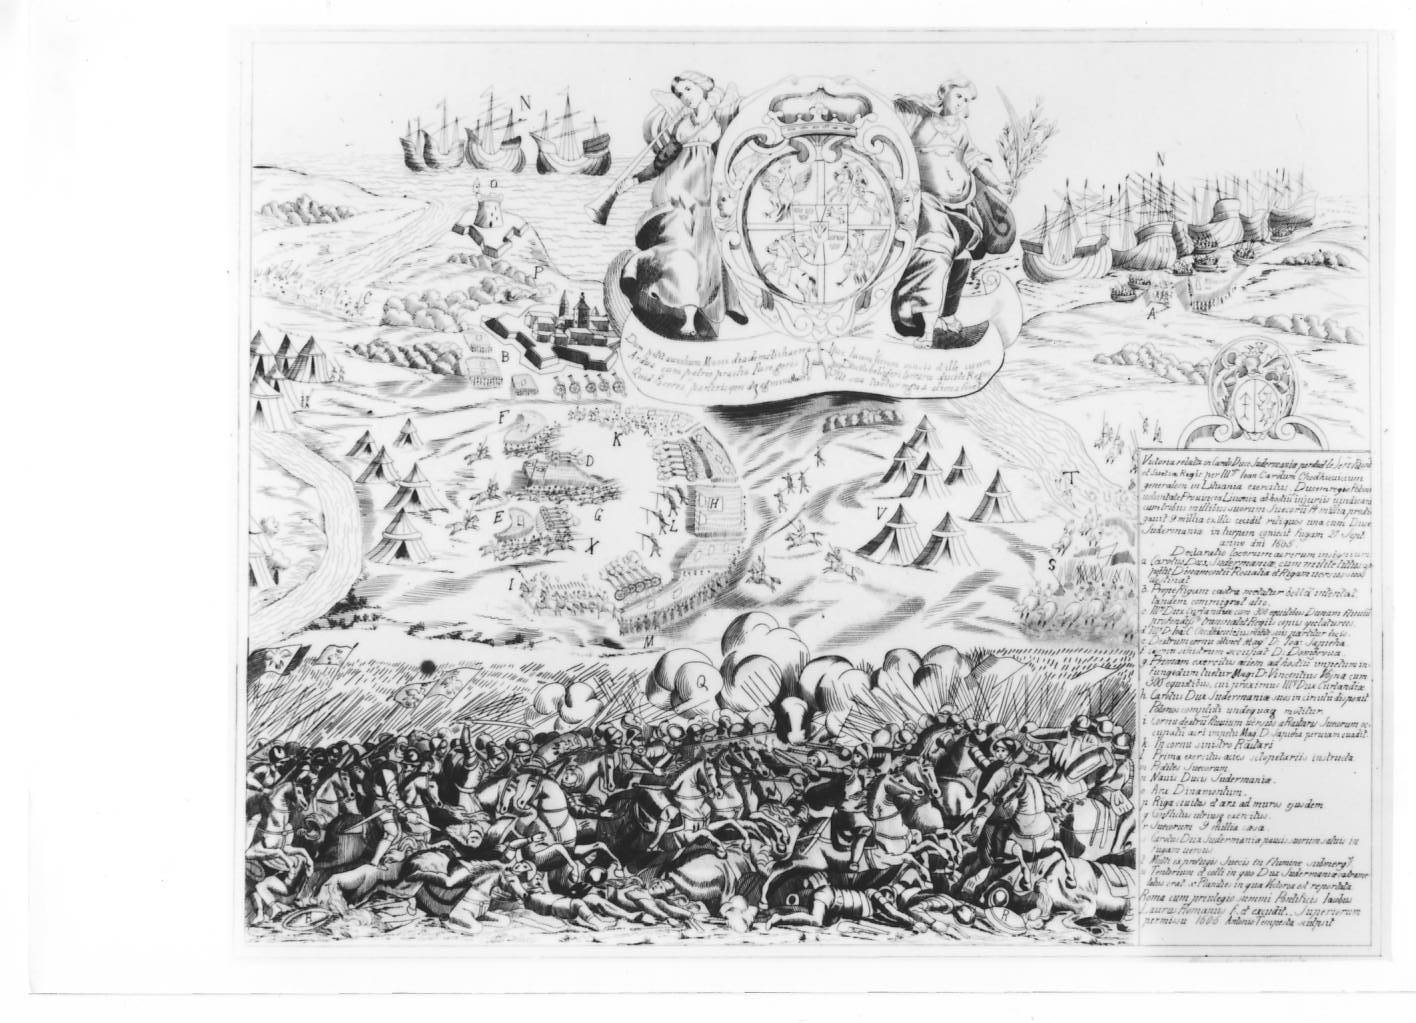 44_bitwa pod kircholmem 1605.jpg